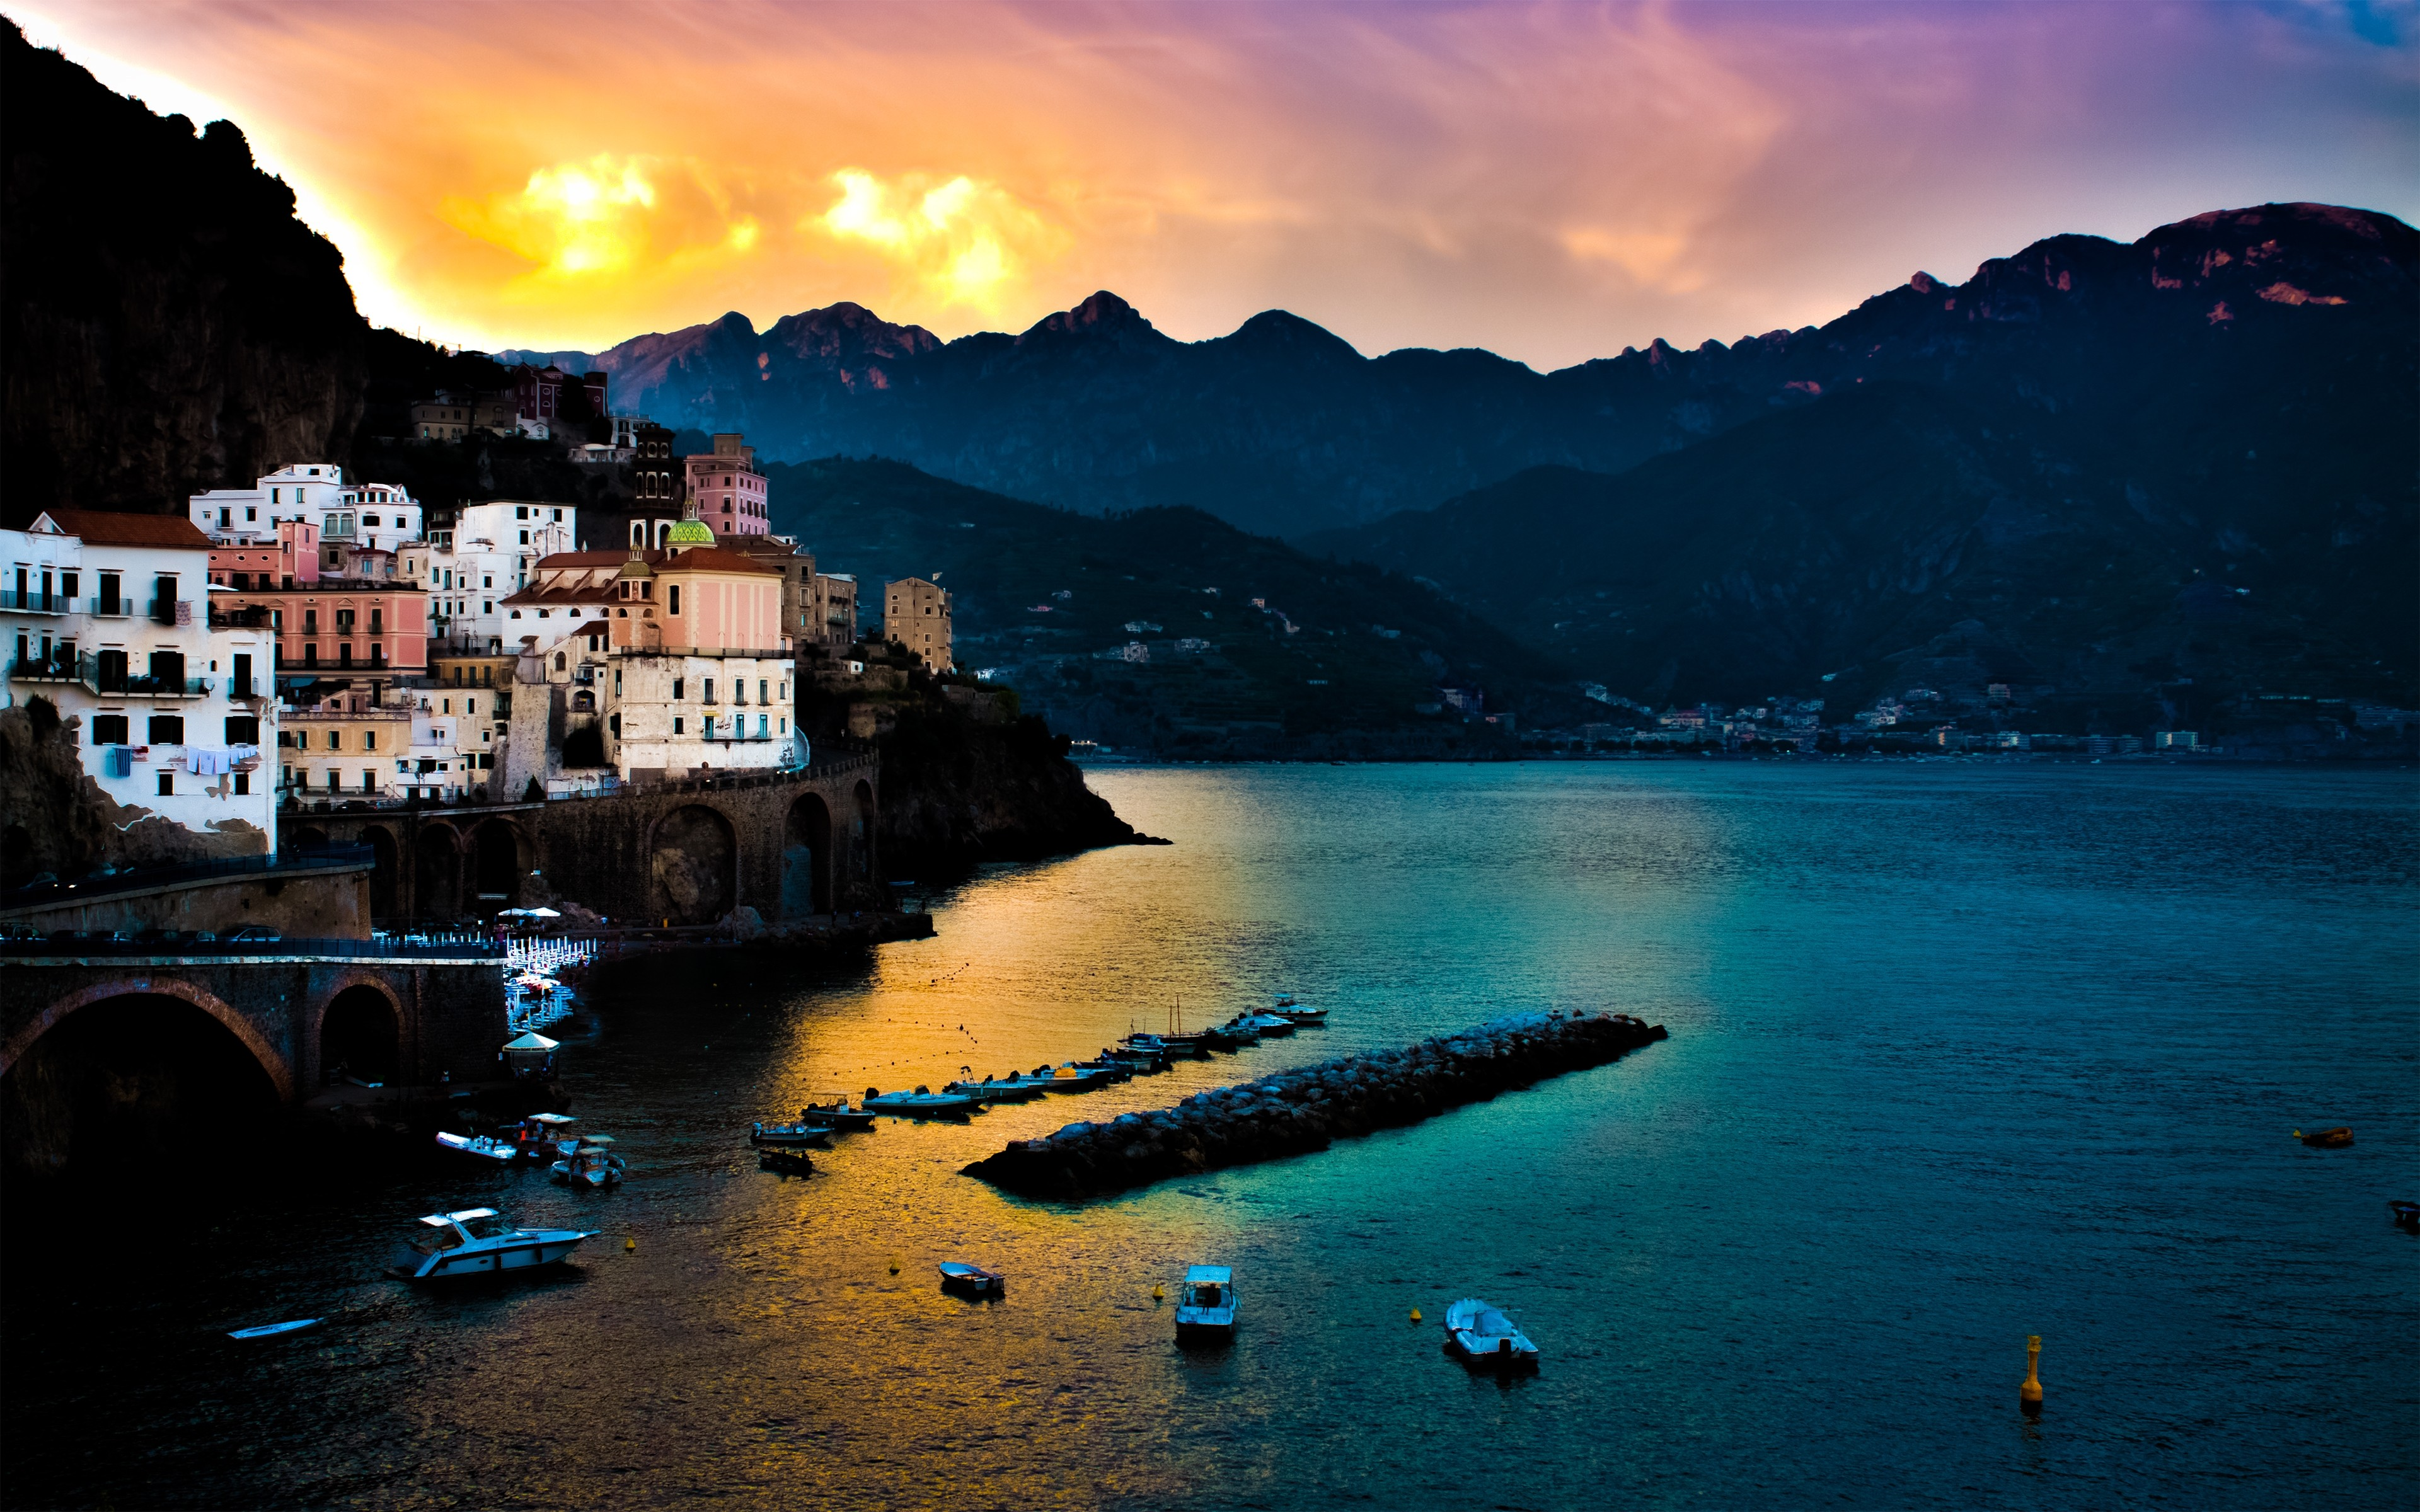 Amalfi 4k ultra hd wallpaper sfondi 3840x2400 id for Sfondi desktop 4k